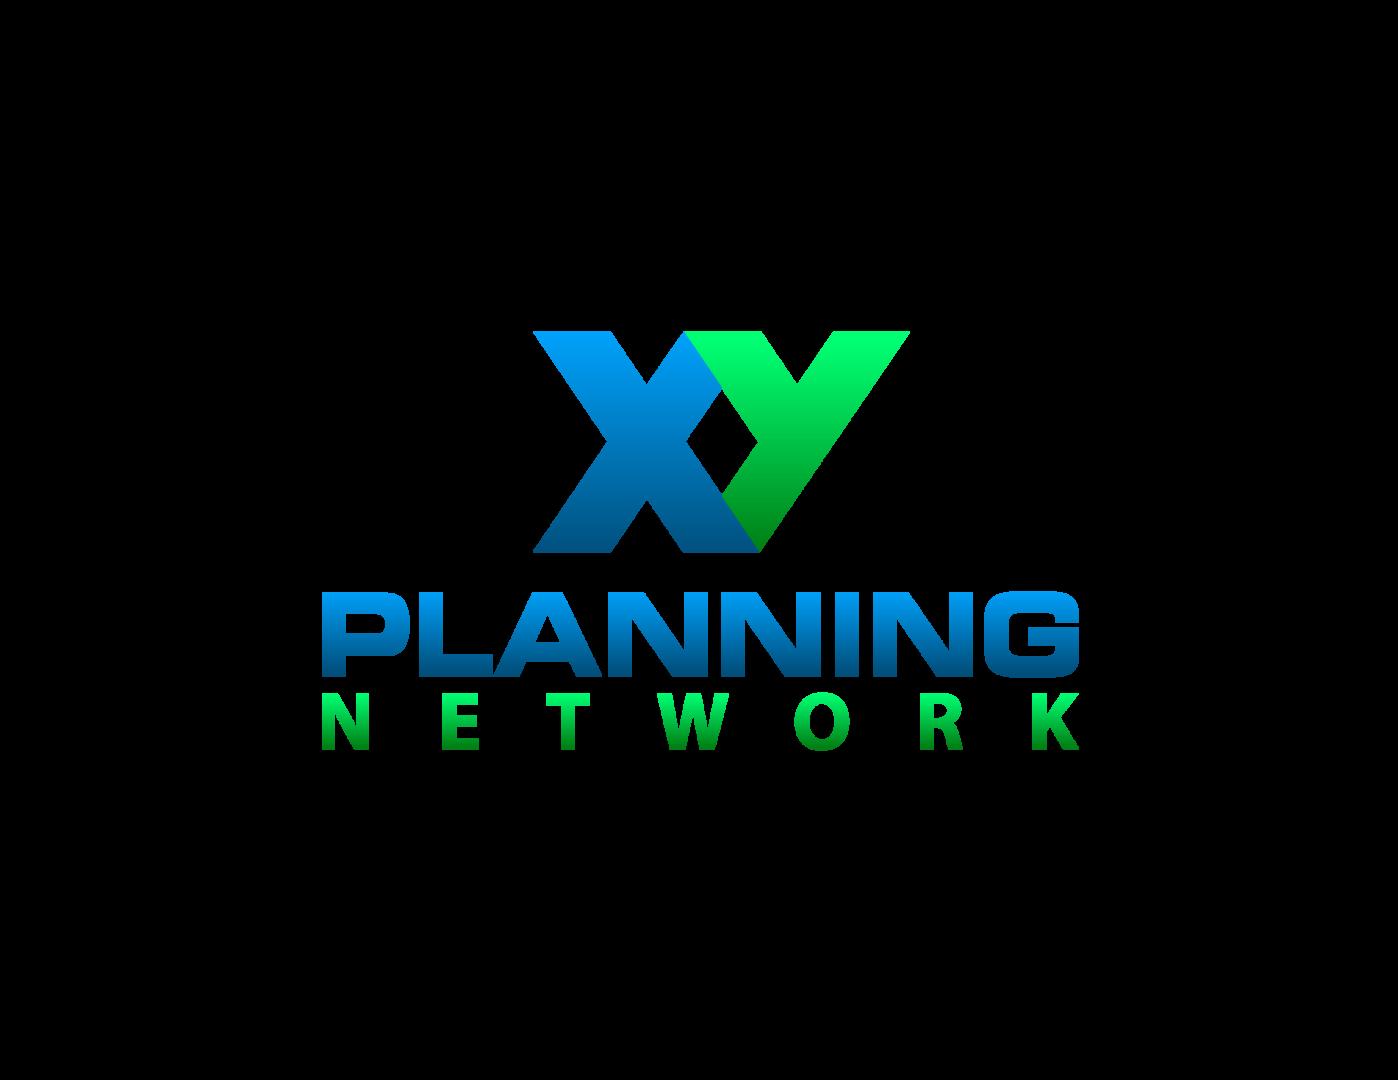 https://secureservercdn.net/198.71.233.230/21i.049.myftpupload.com/wp-content/uploads/2020/08/logo2.png